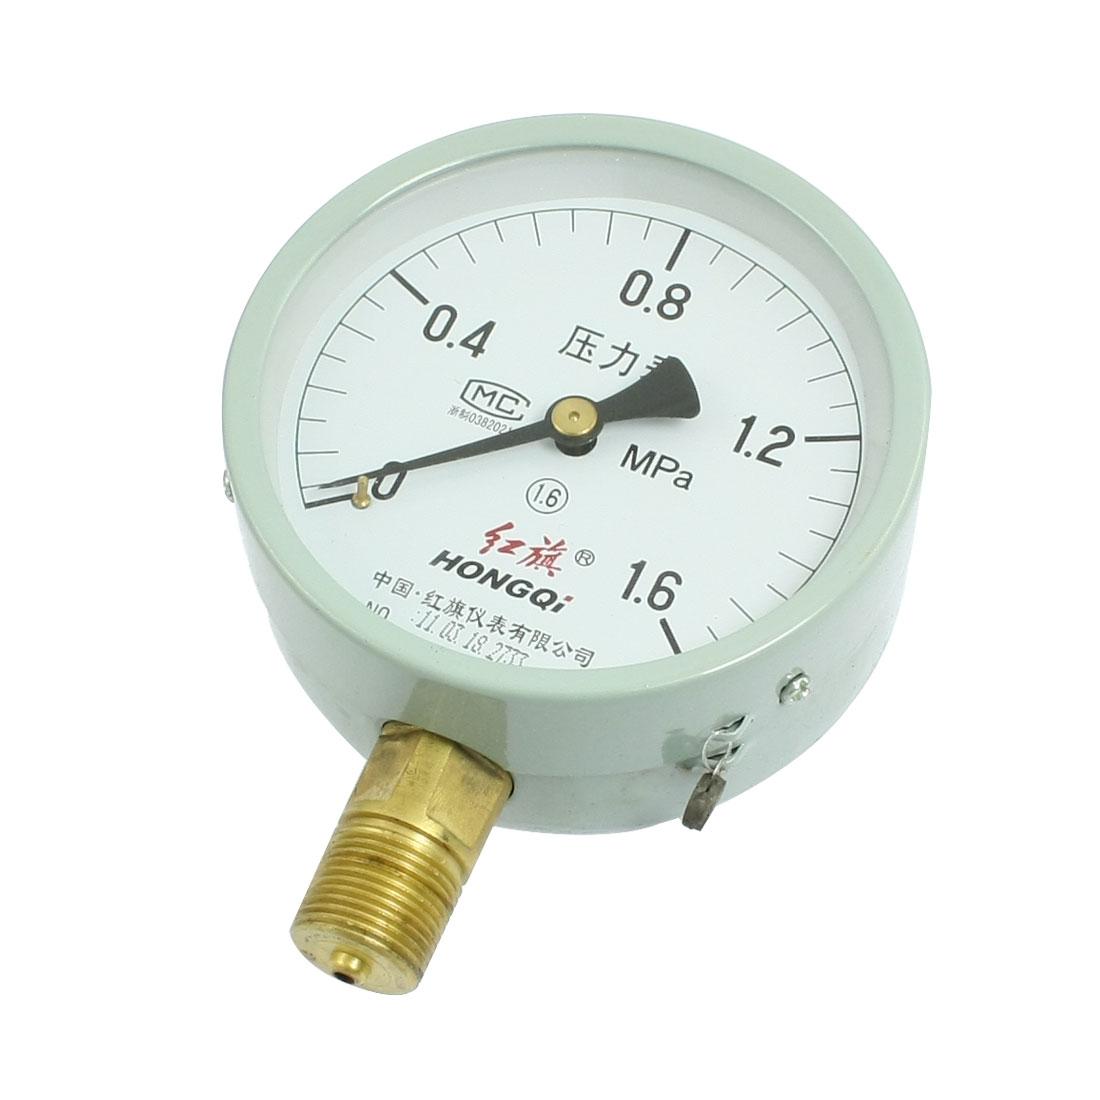 "Horizontal Mount 1/2"" Thread Water Air Pressure Gauge 0-1.6 MPa"